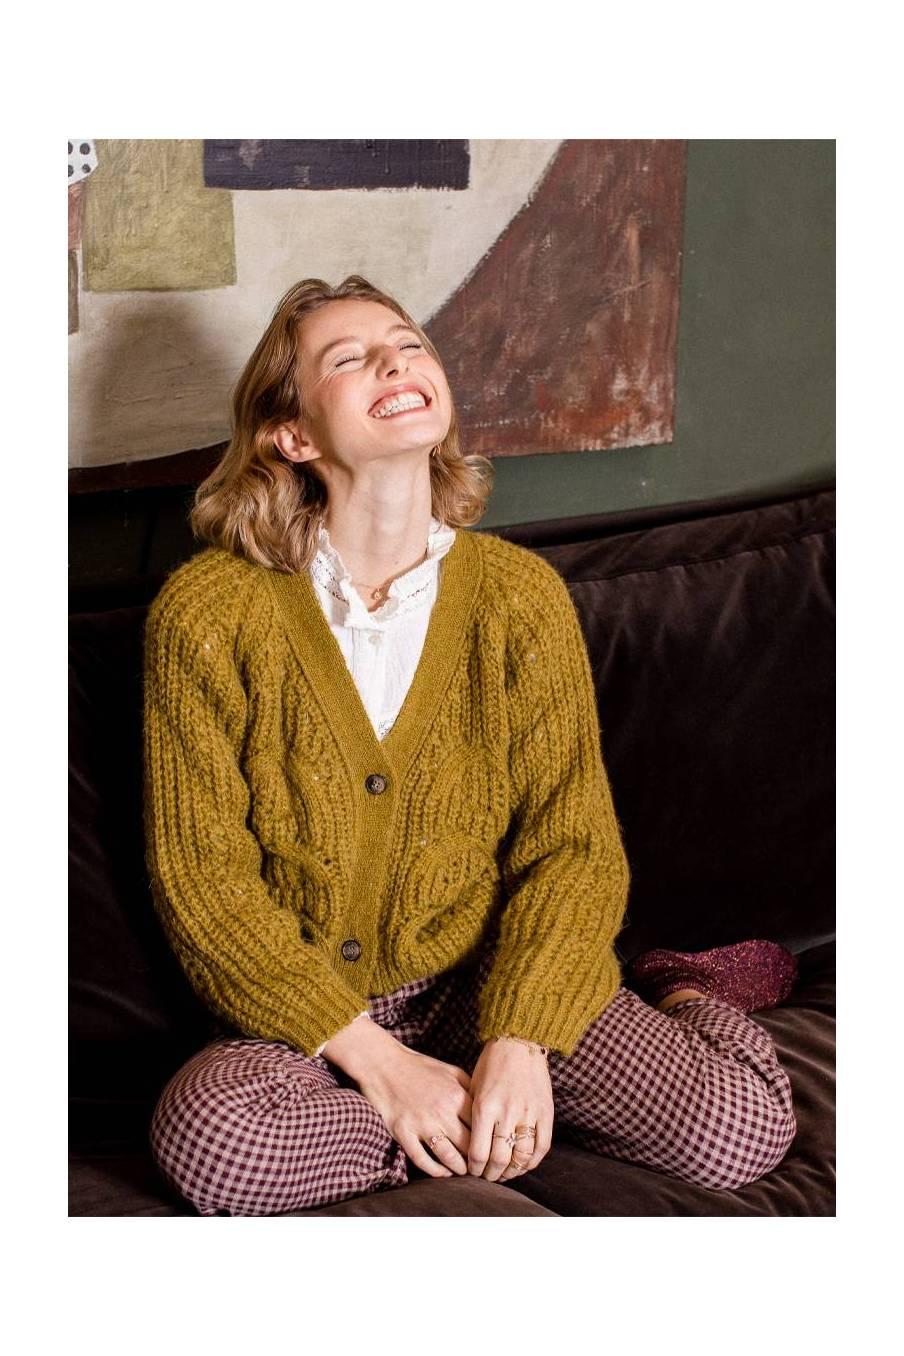 boheme chic vintage pantalon femme aleksy aubergine vichy